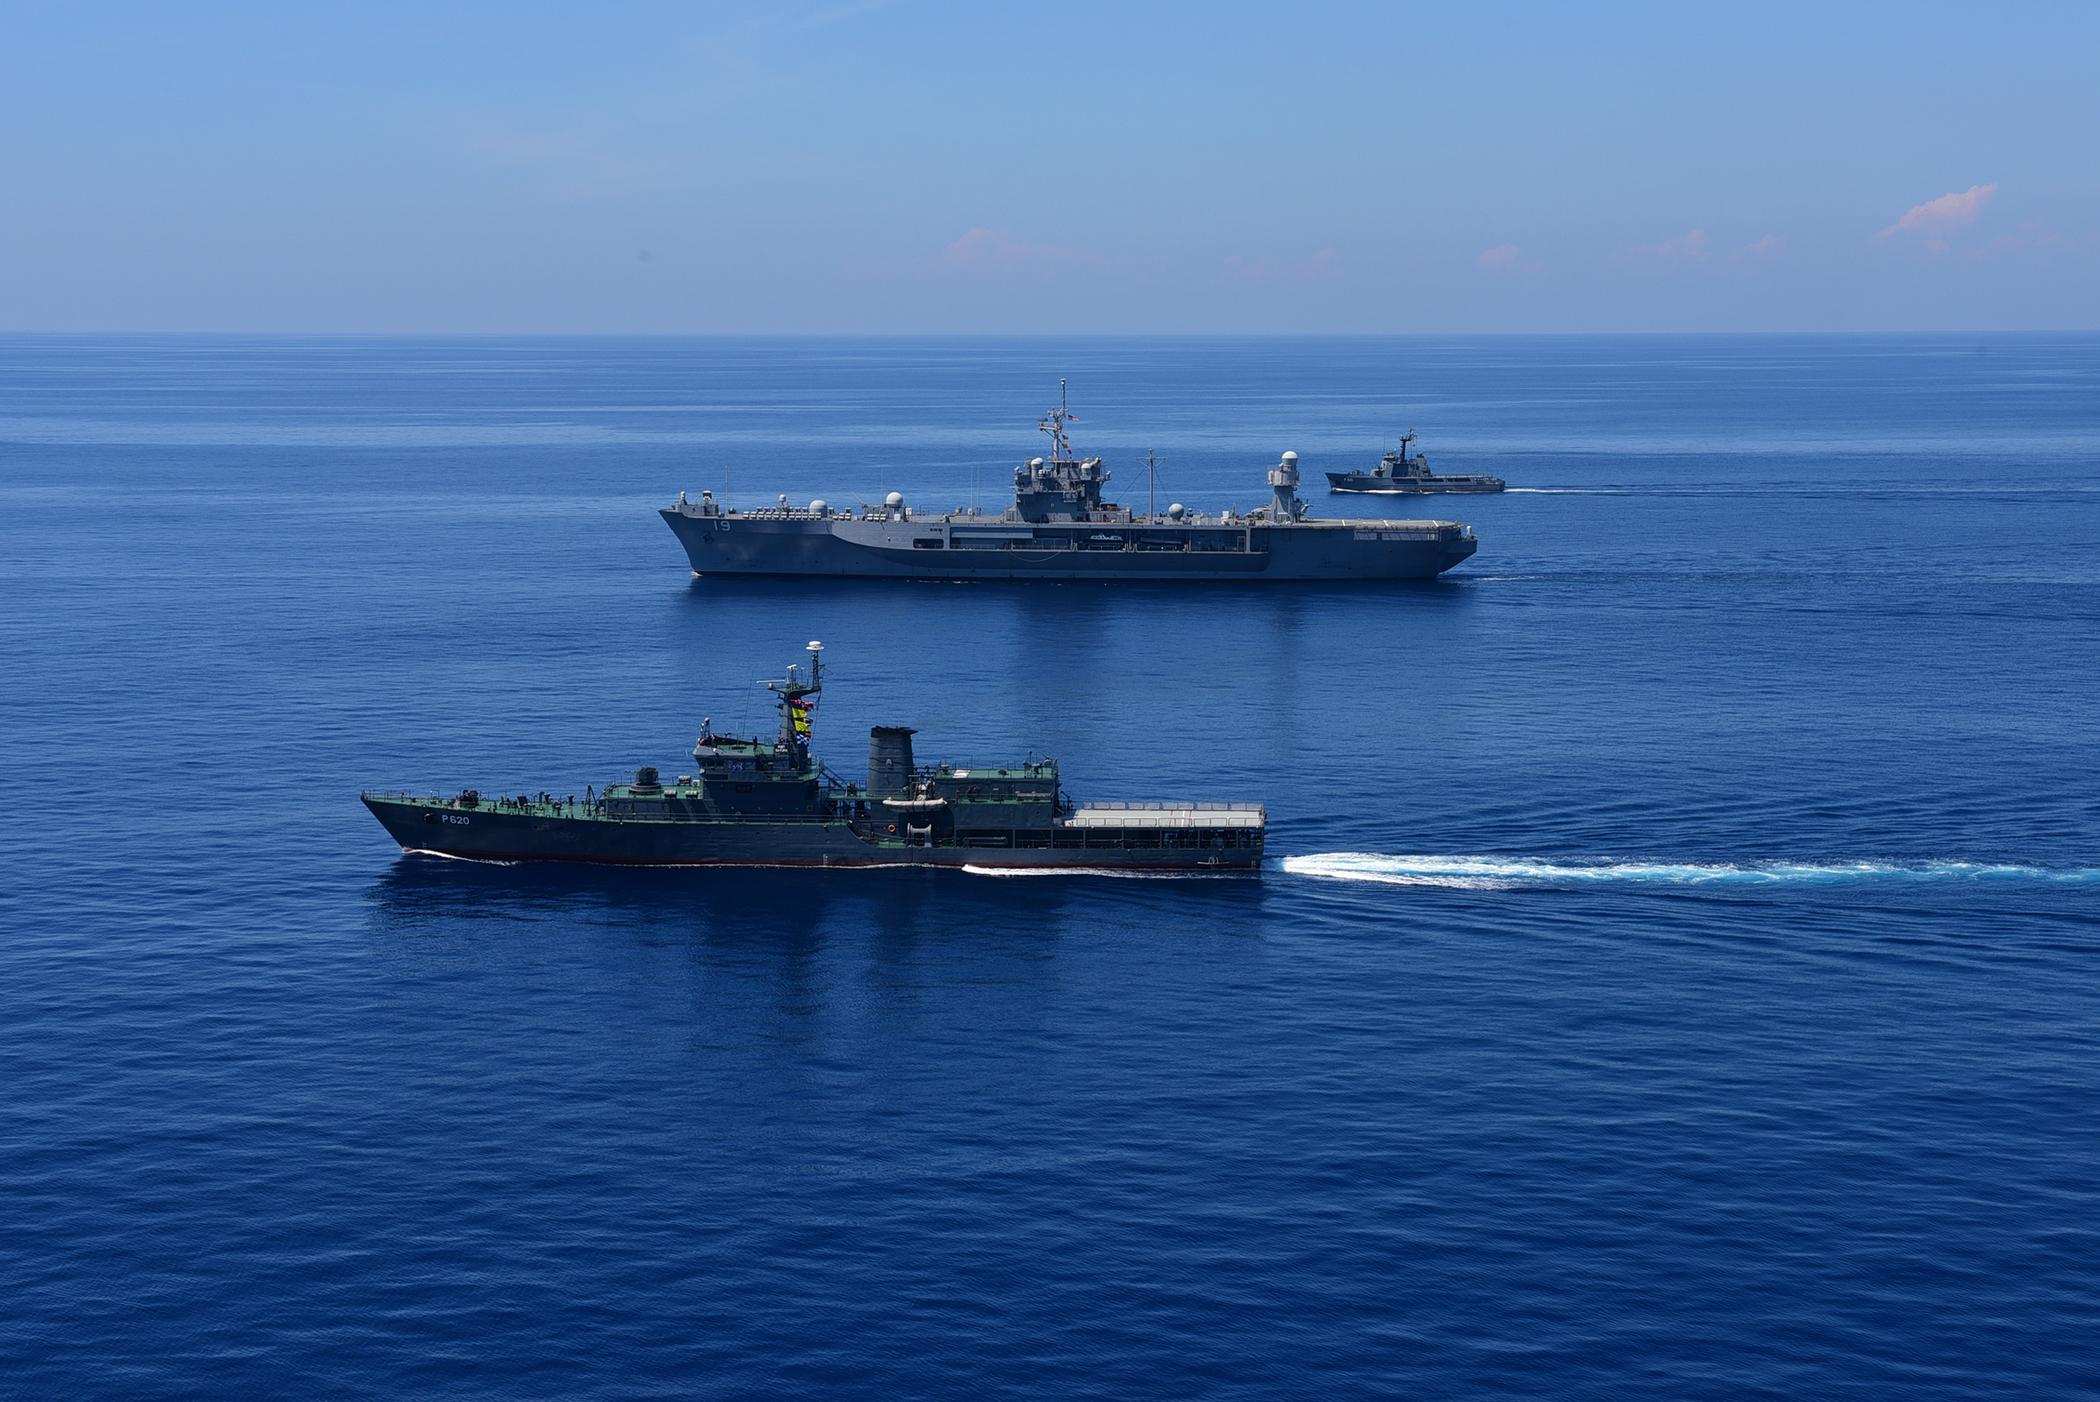 India and Sri Lanka Begin Joint Naval Exercise SLINEX 2017